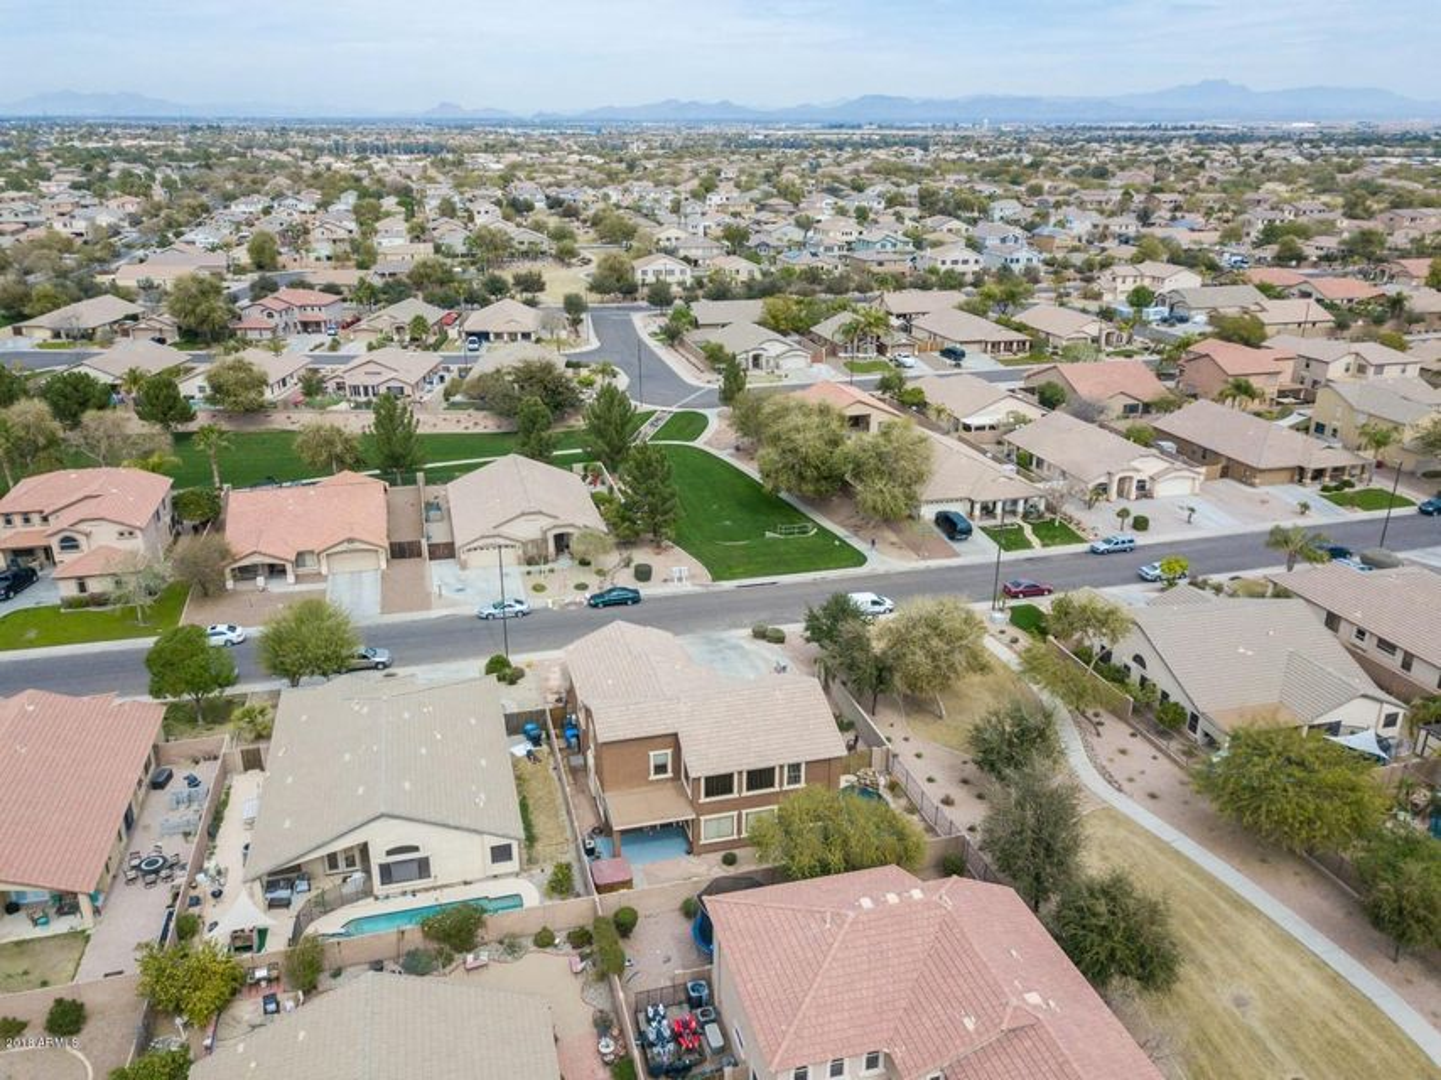 MLS 5734395 3893 E BARANCA Road, Gilbert, AZ 85297 Gilbert AZ Coronado Ranch